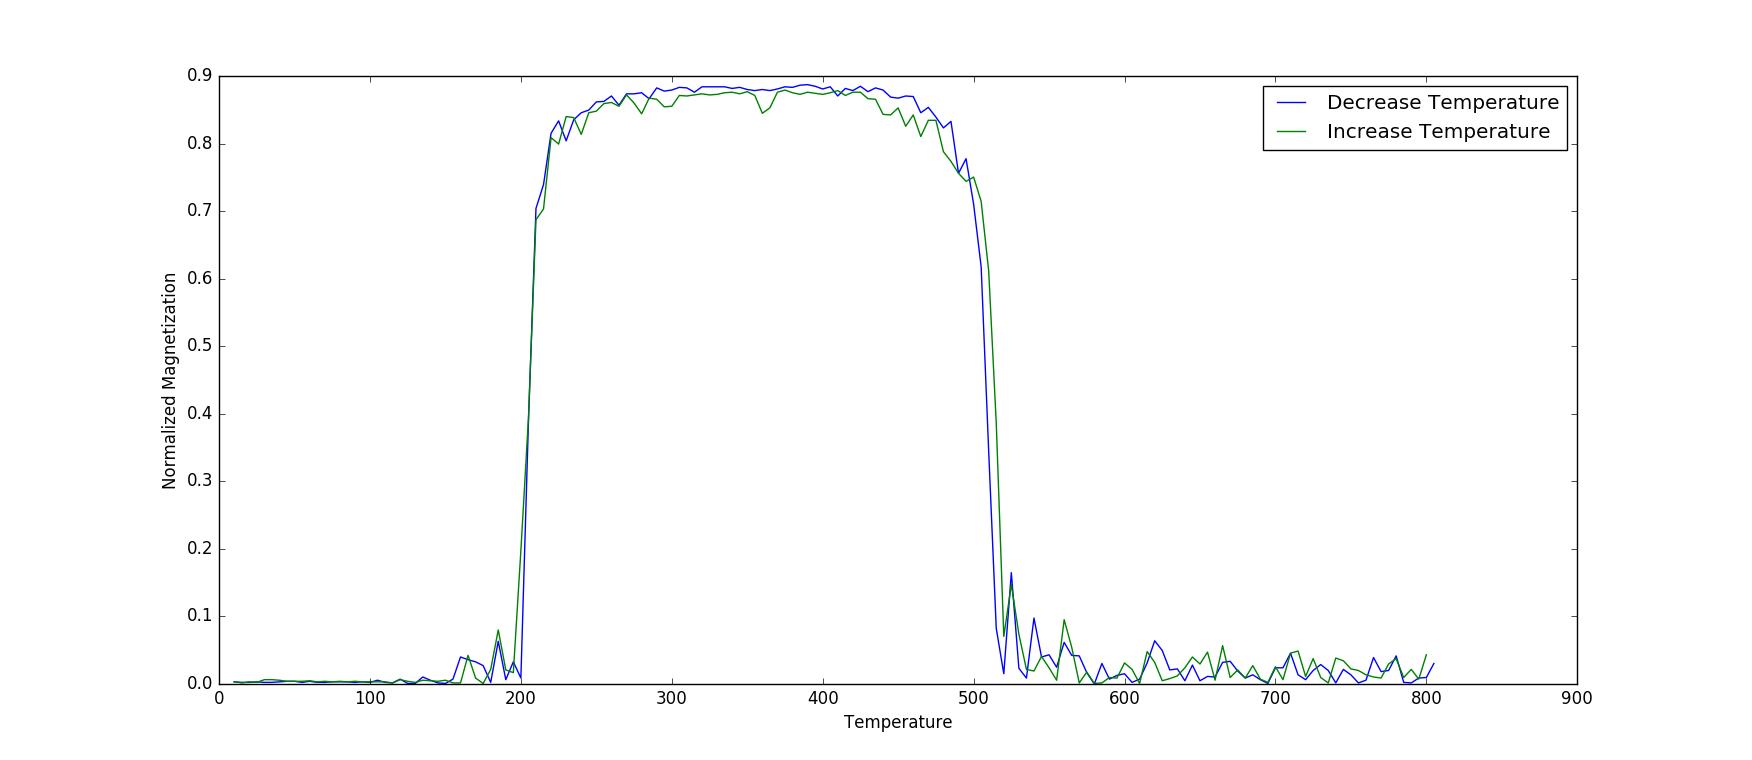 MagneticTransition_rho-10_kb-1_decay-500-no-FOMT.png